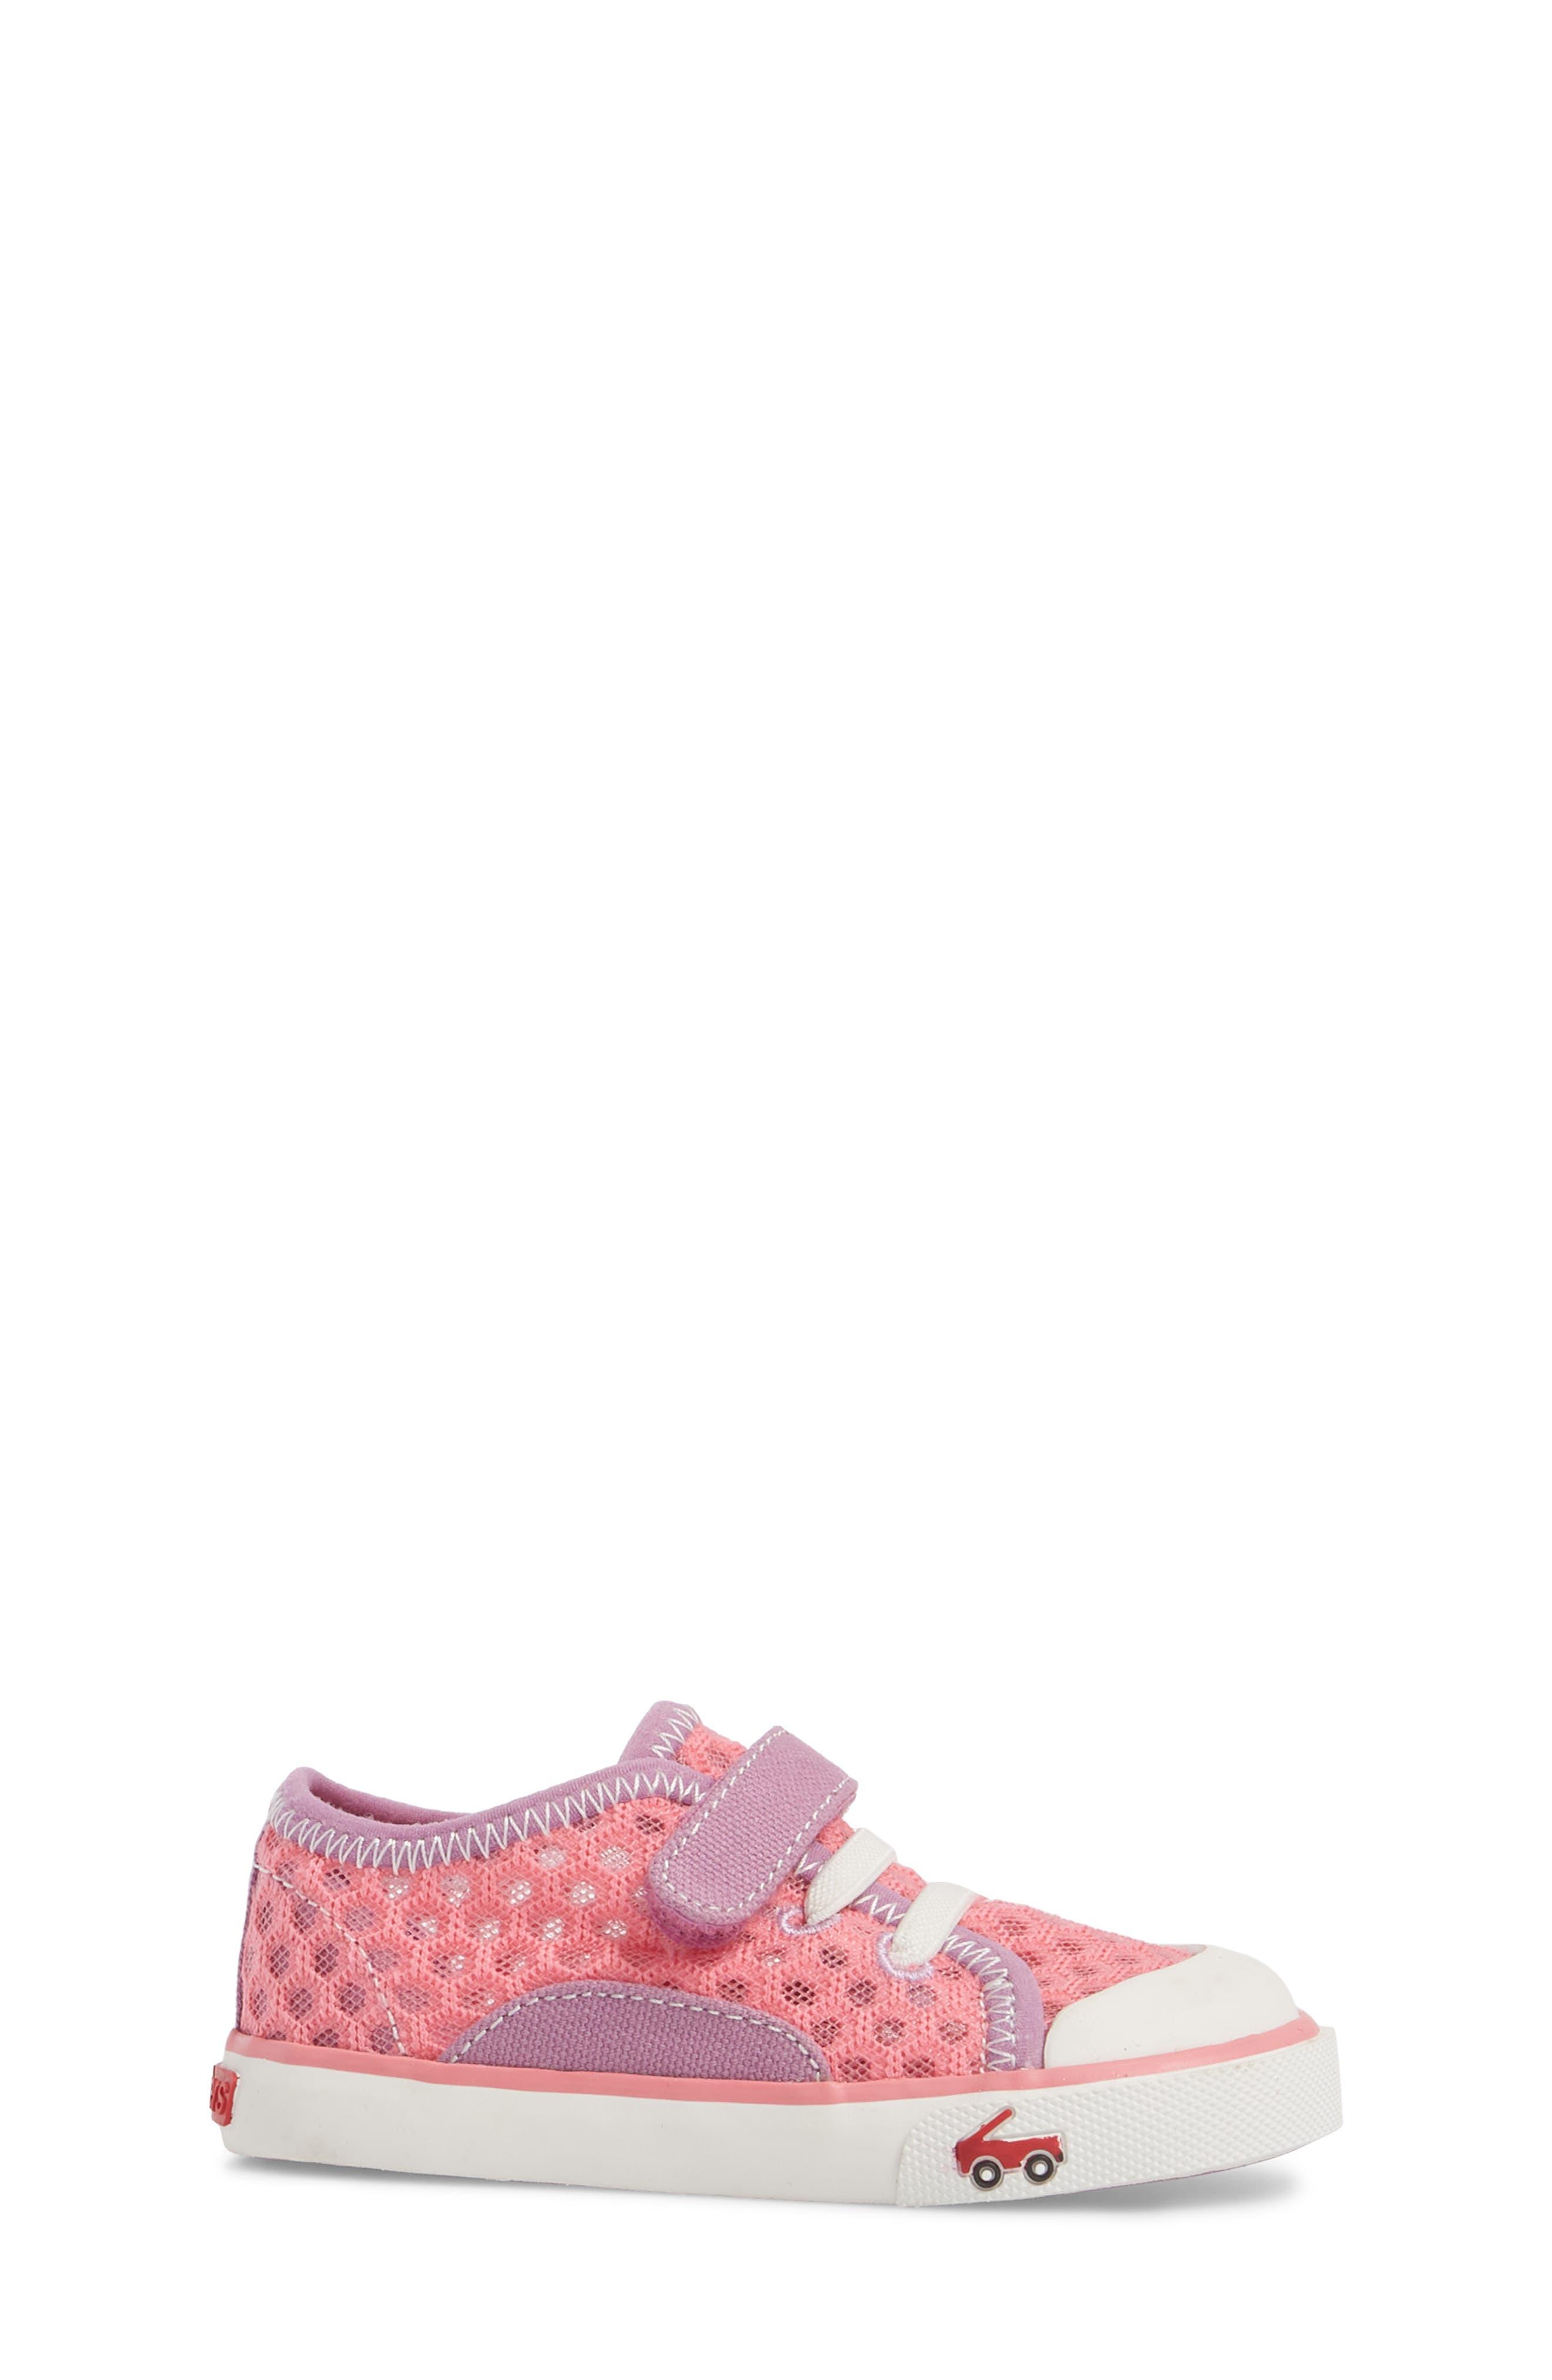 Saylor Sneaker,                             Alternate thumbnail 3, color,                             Hot Pink